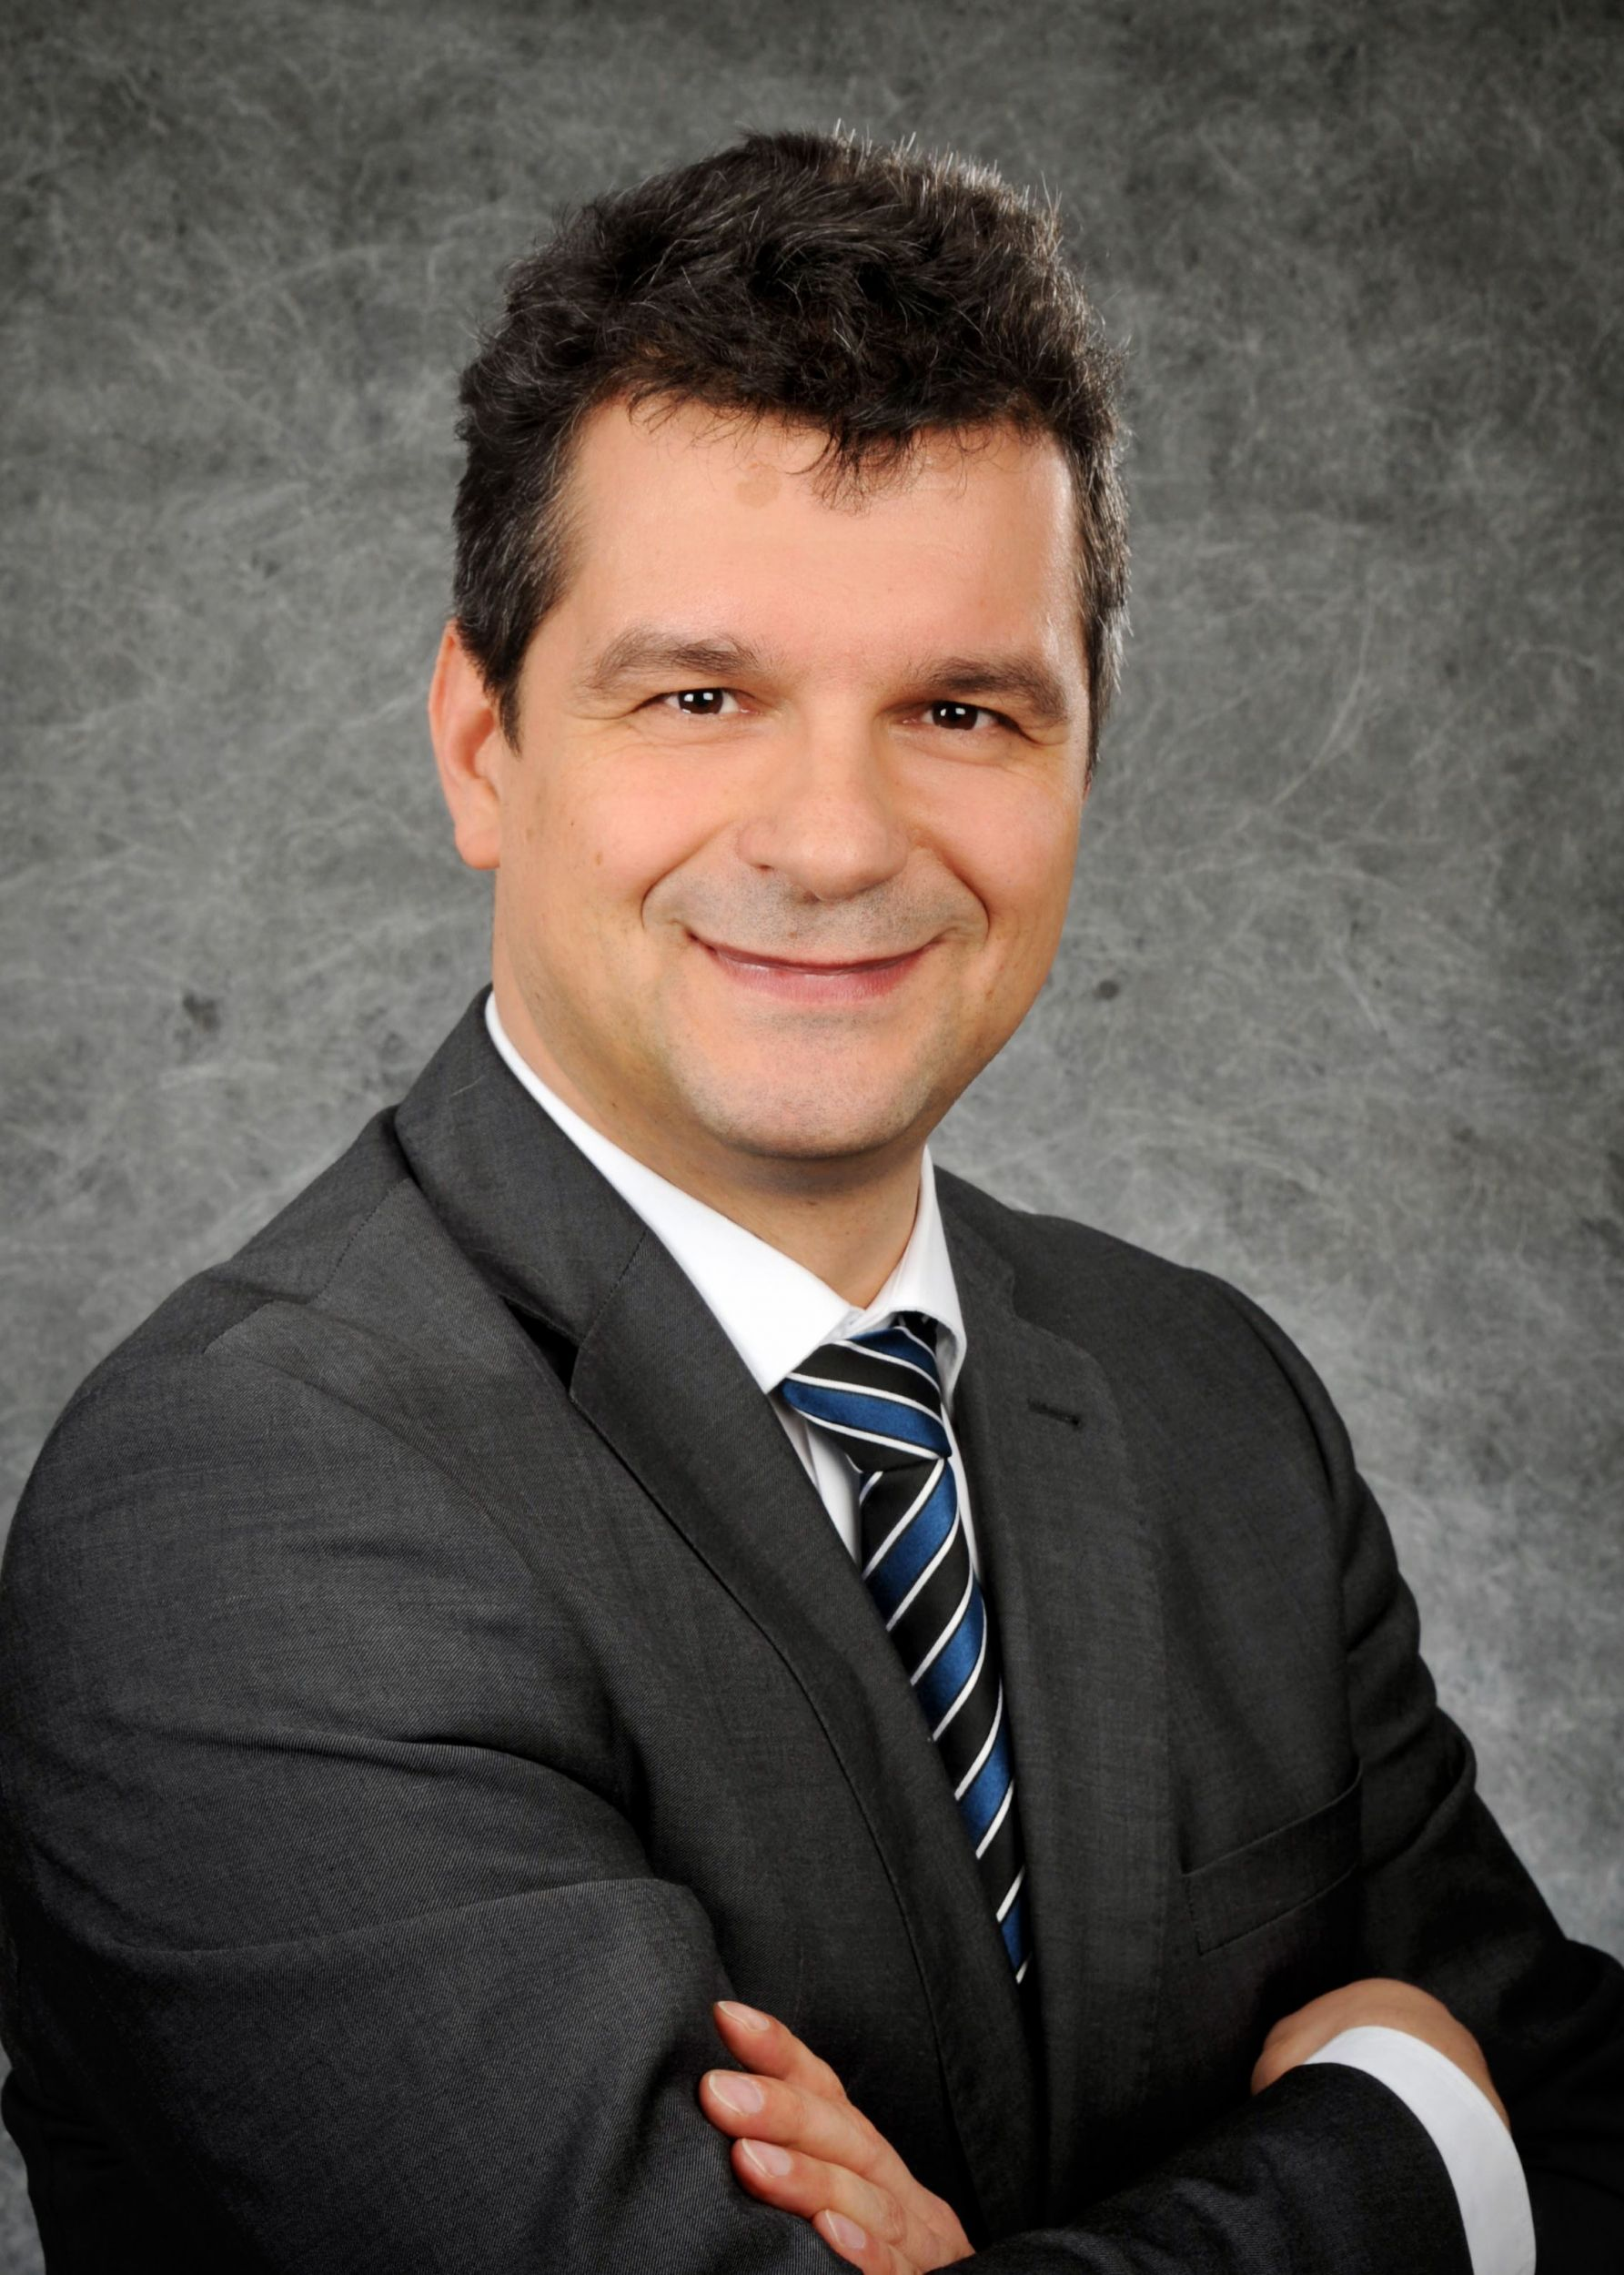 Gunnar Daßler ist neuer Vertriebsleiter bei Dresden Elektronik